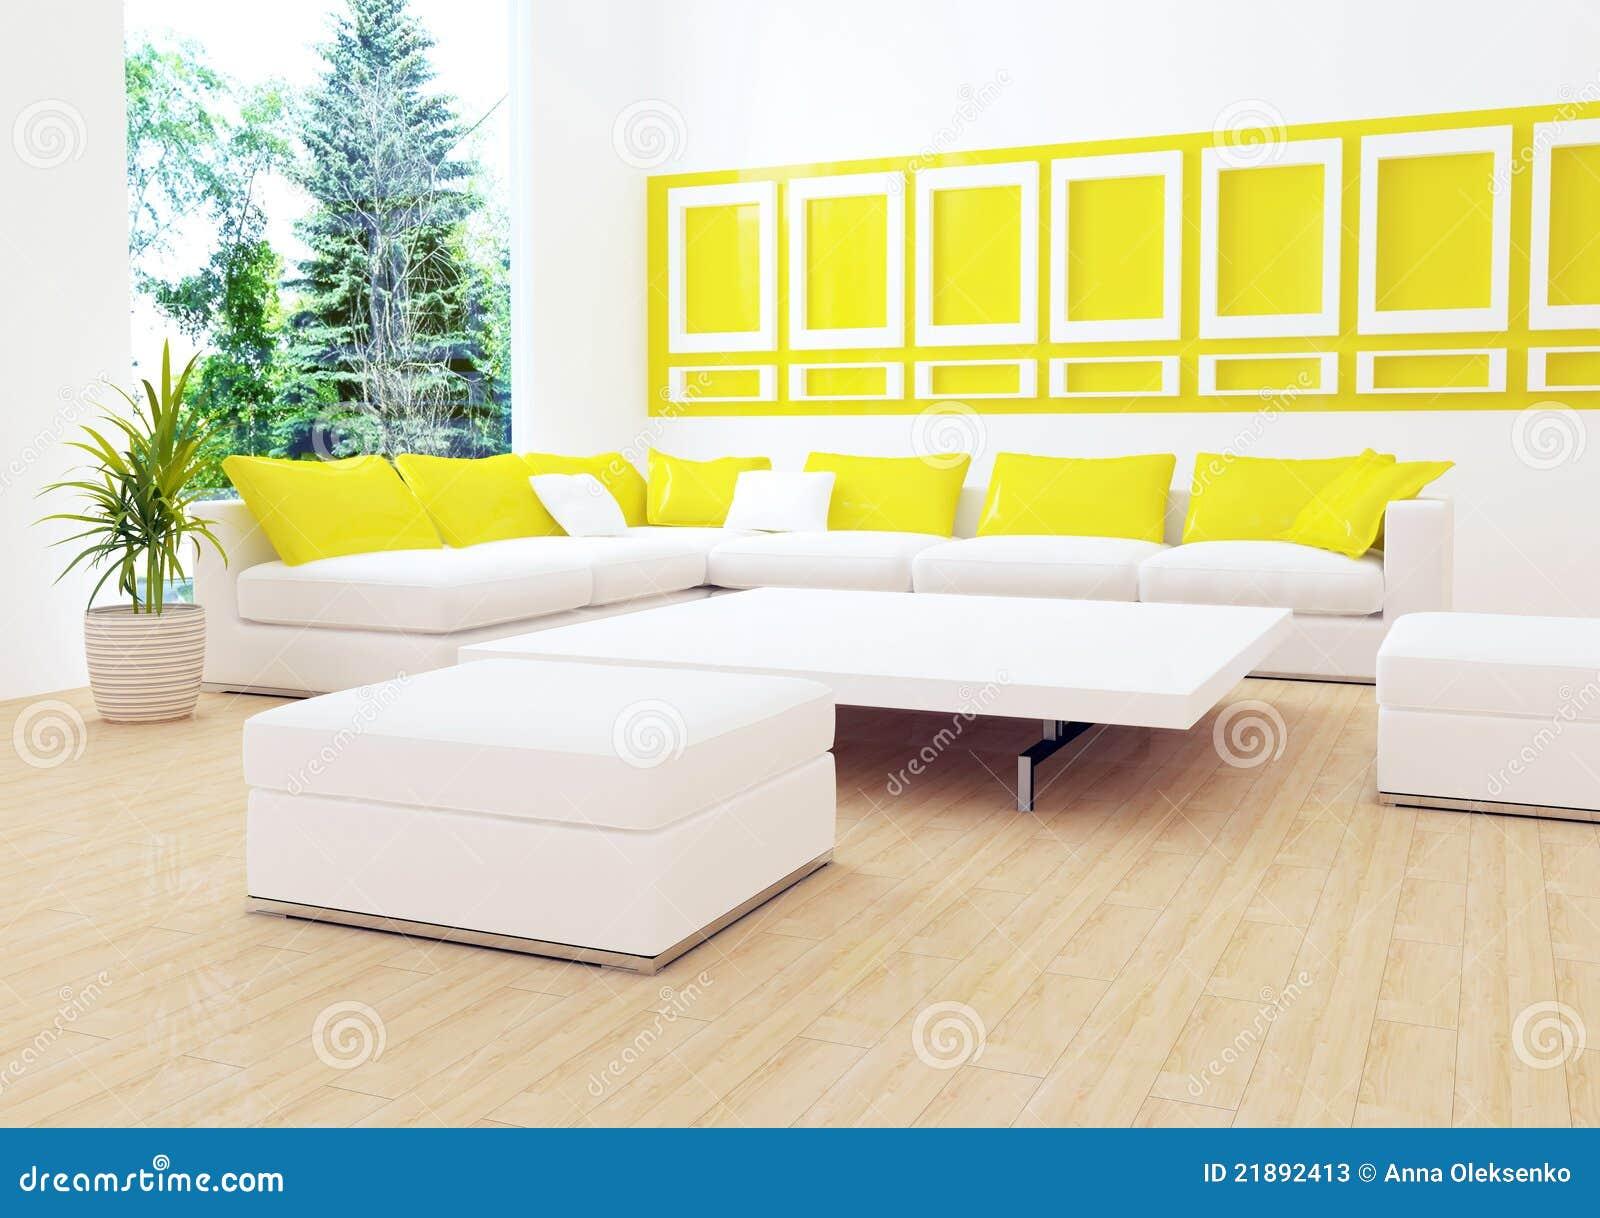 Dise o interior de sala de estar blanca moderna fotos de for Sala de estar moderna grande